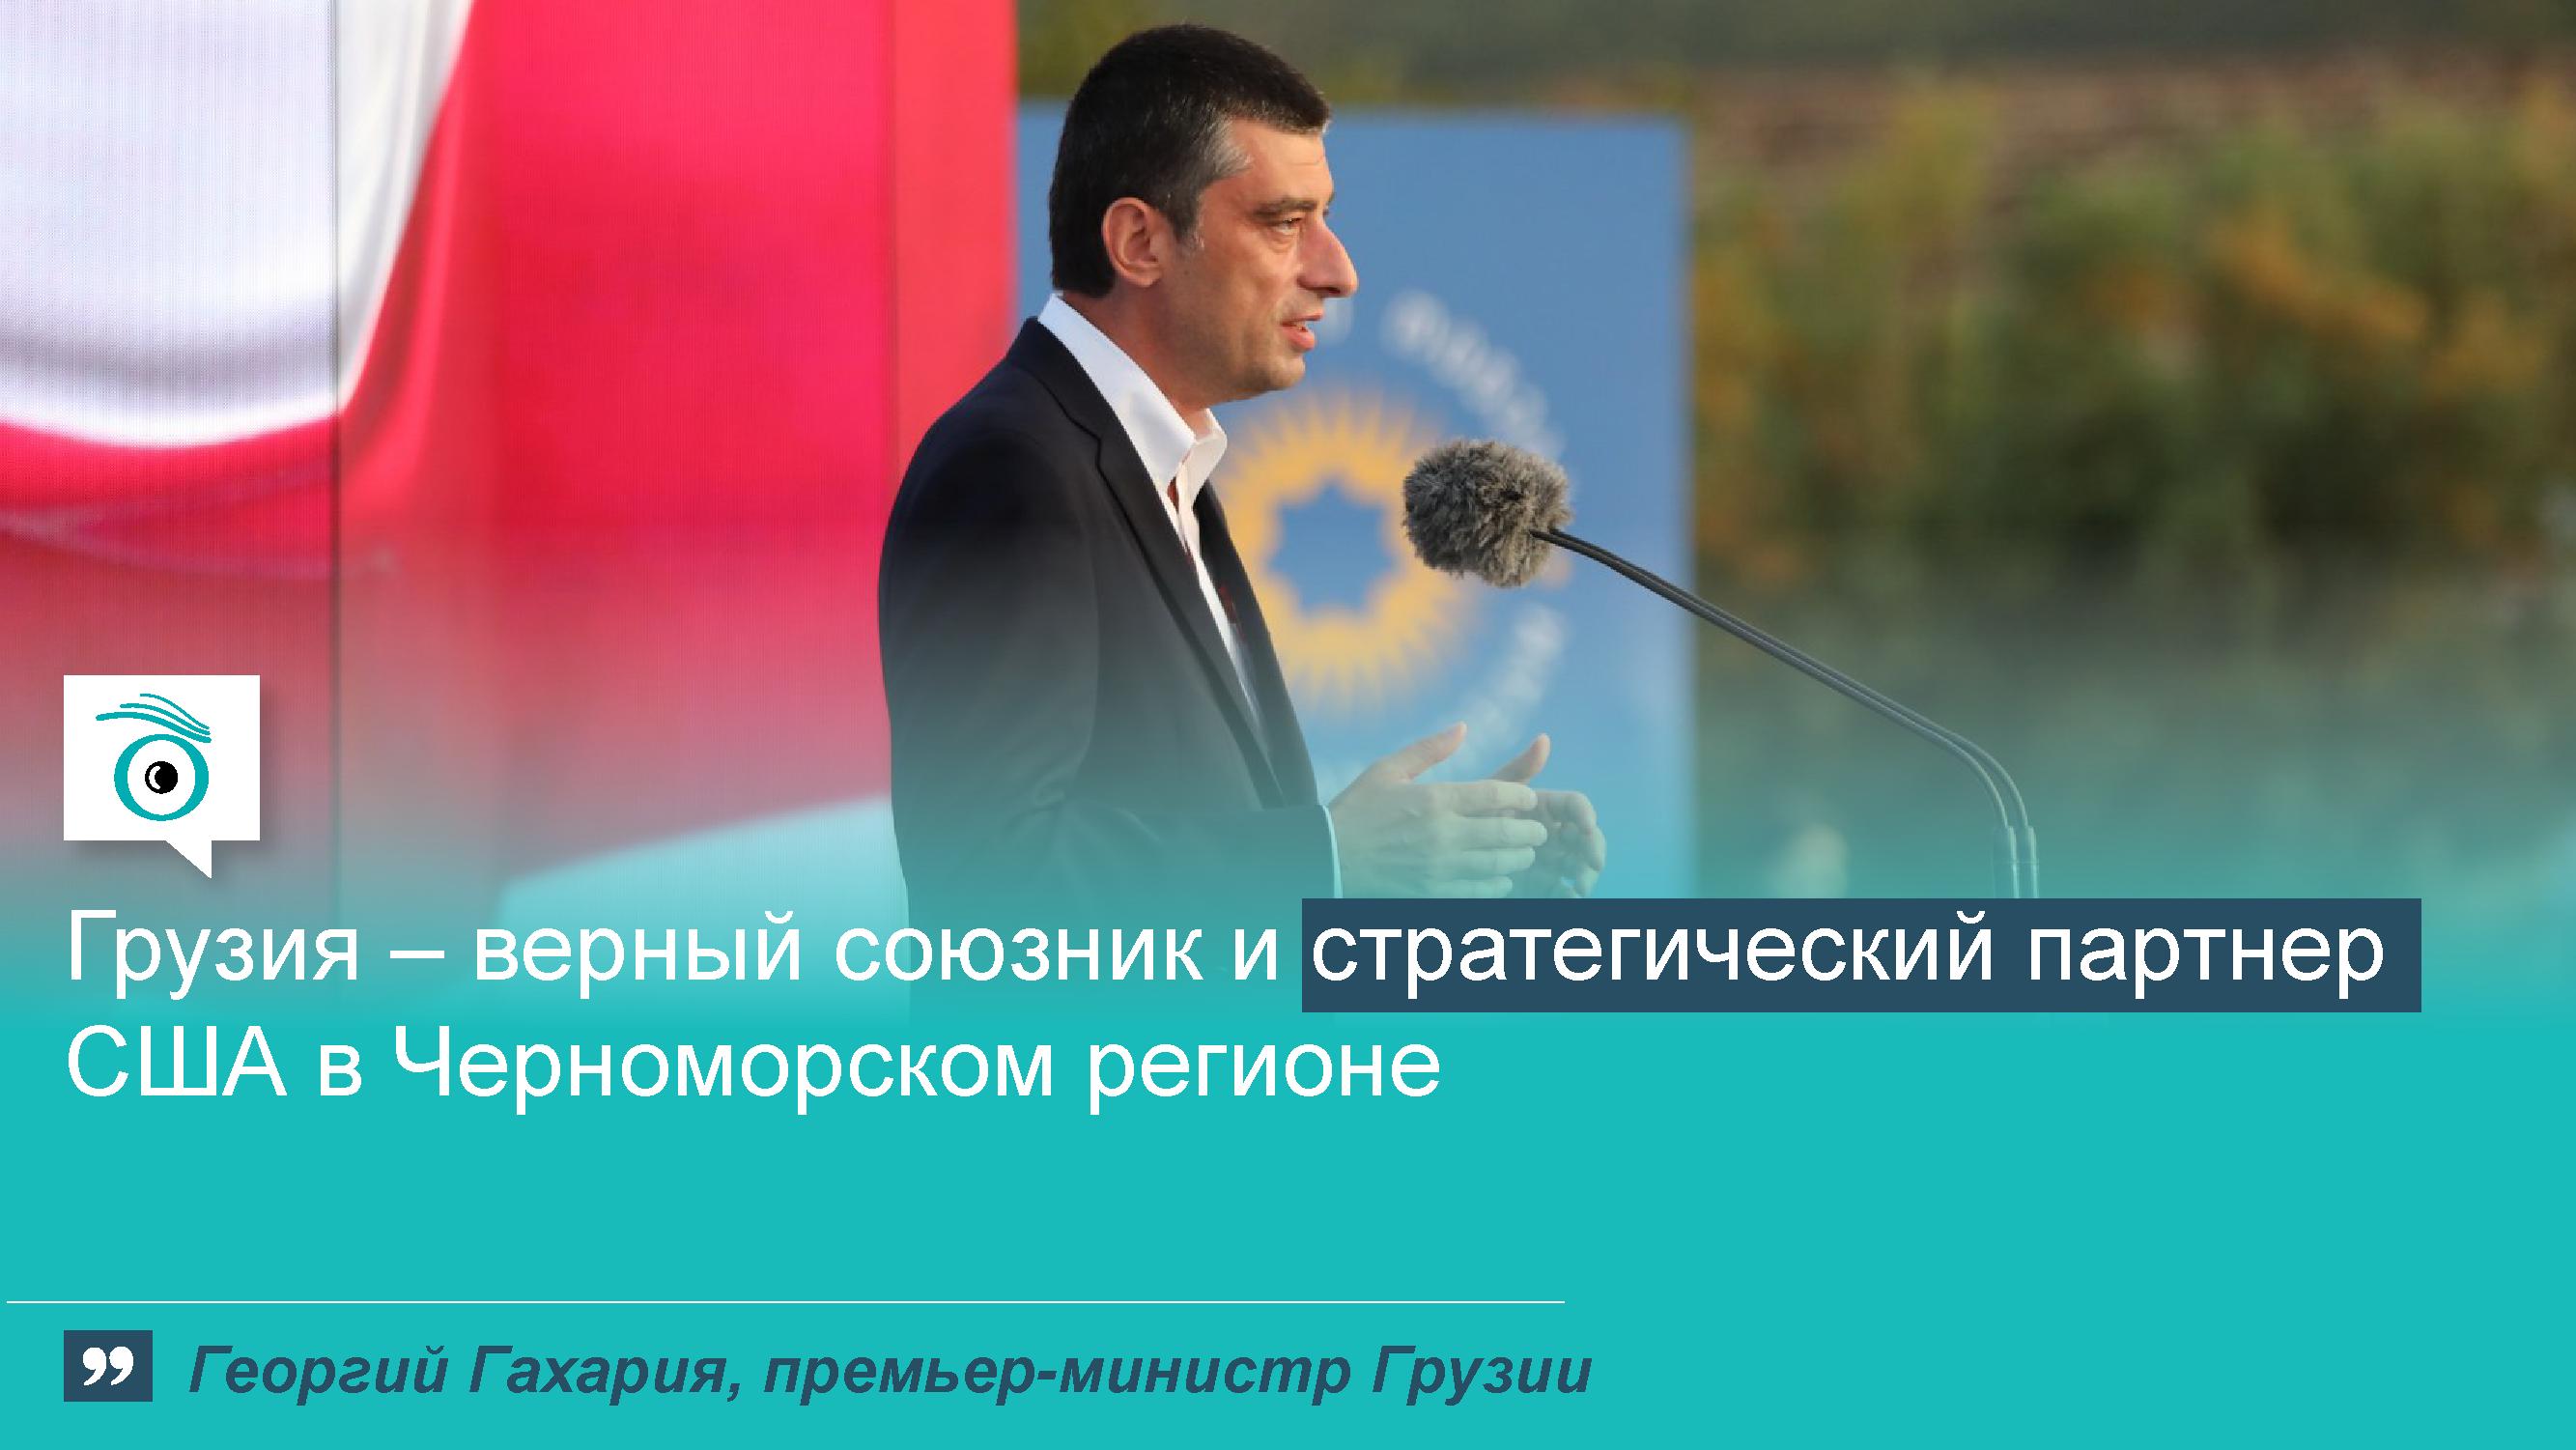 gahariya ssha fb 01 01 #цитата дня Георгий Гахария, Грузия, сша, Черное море